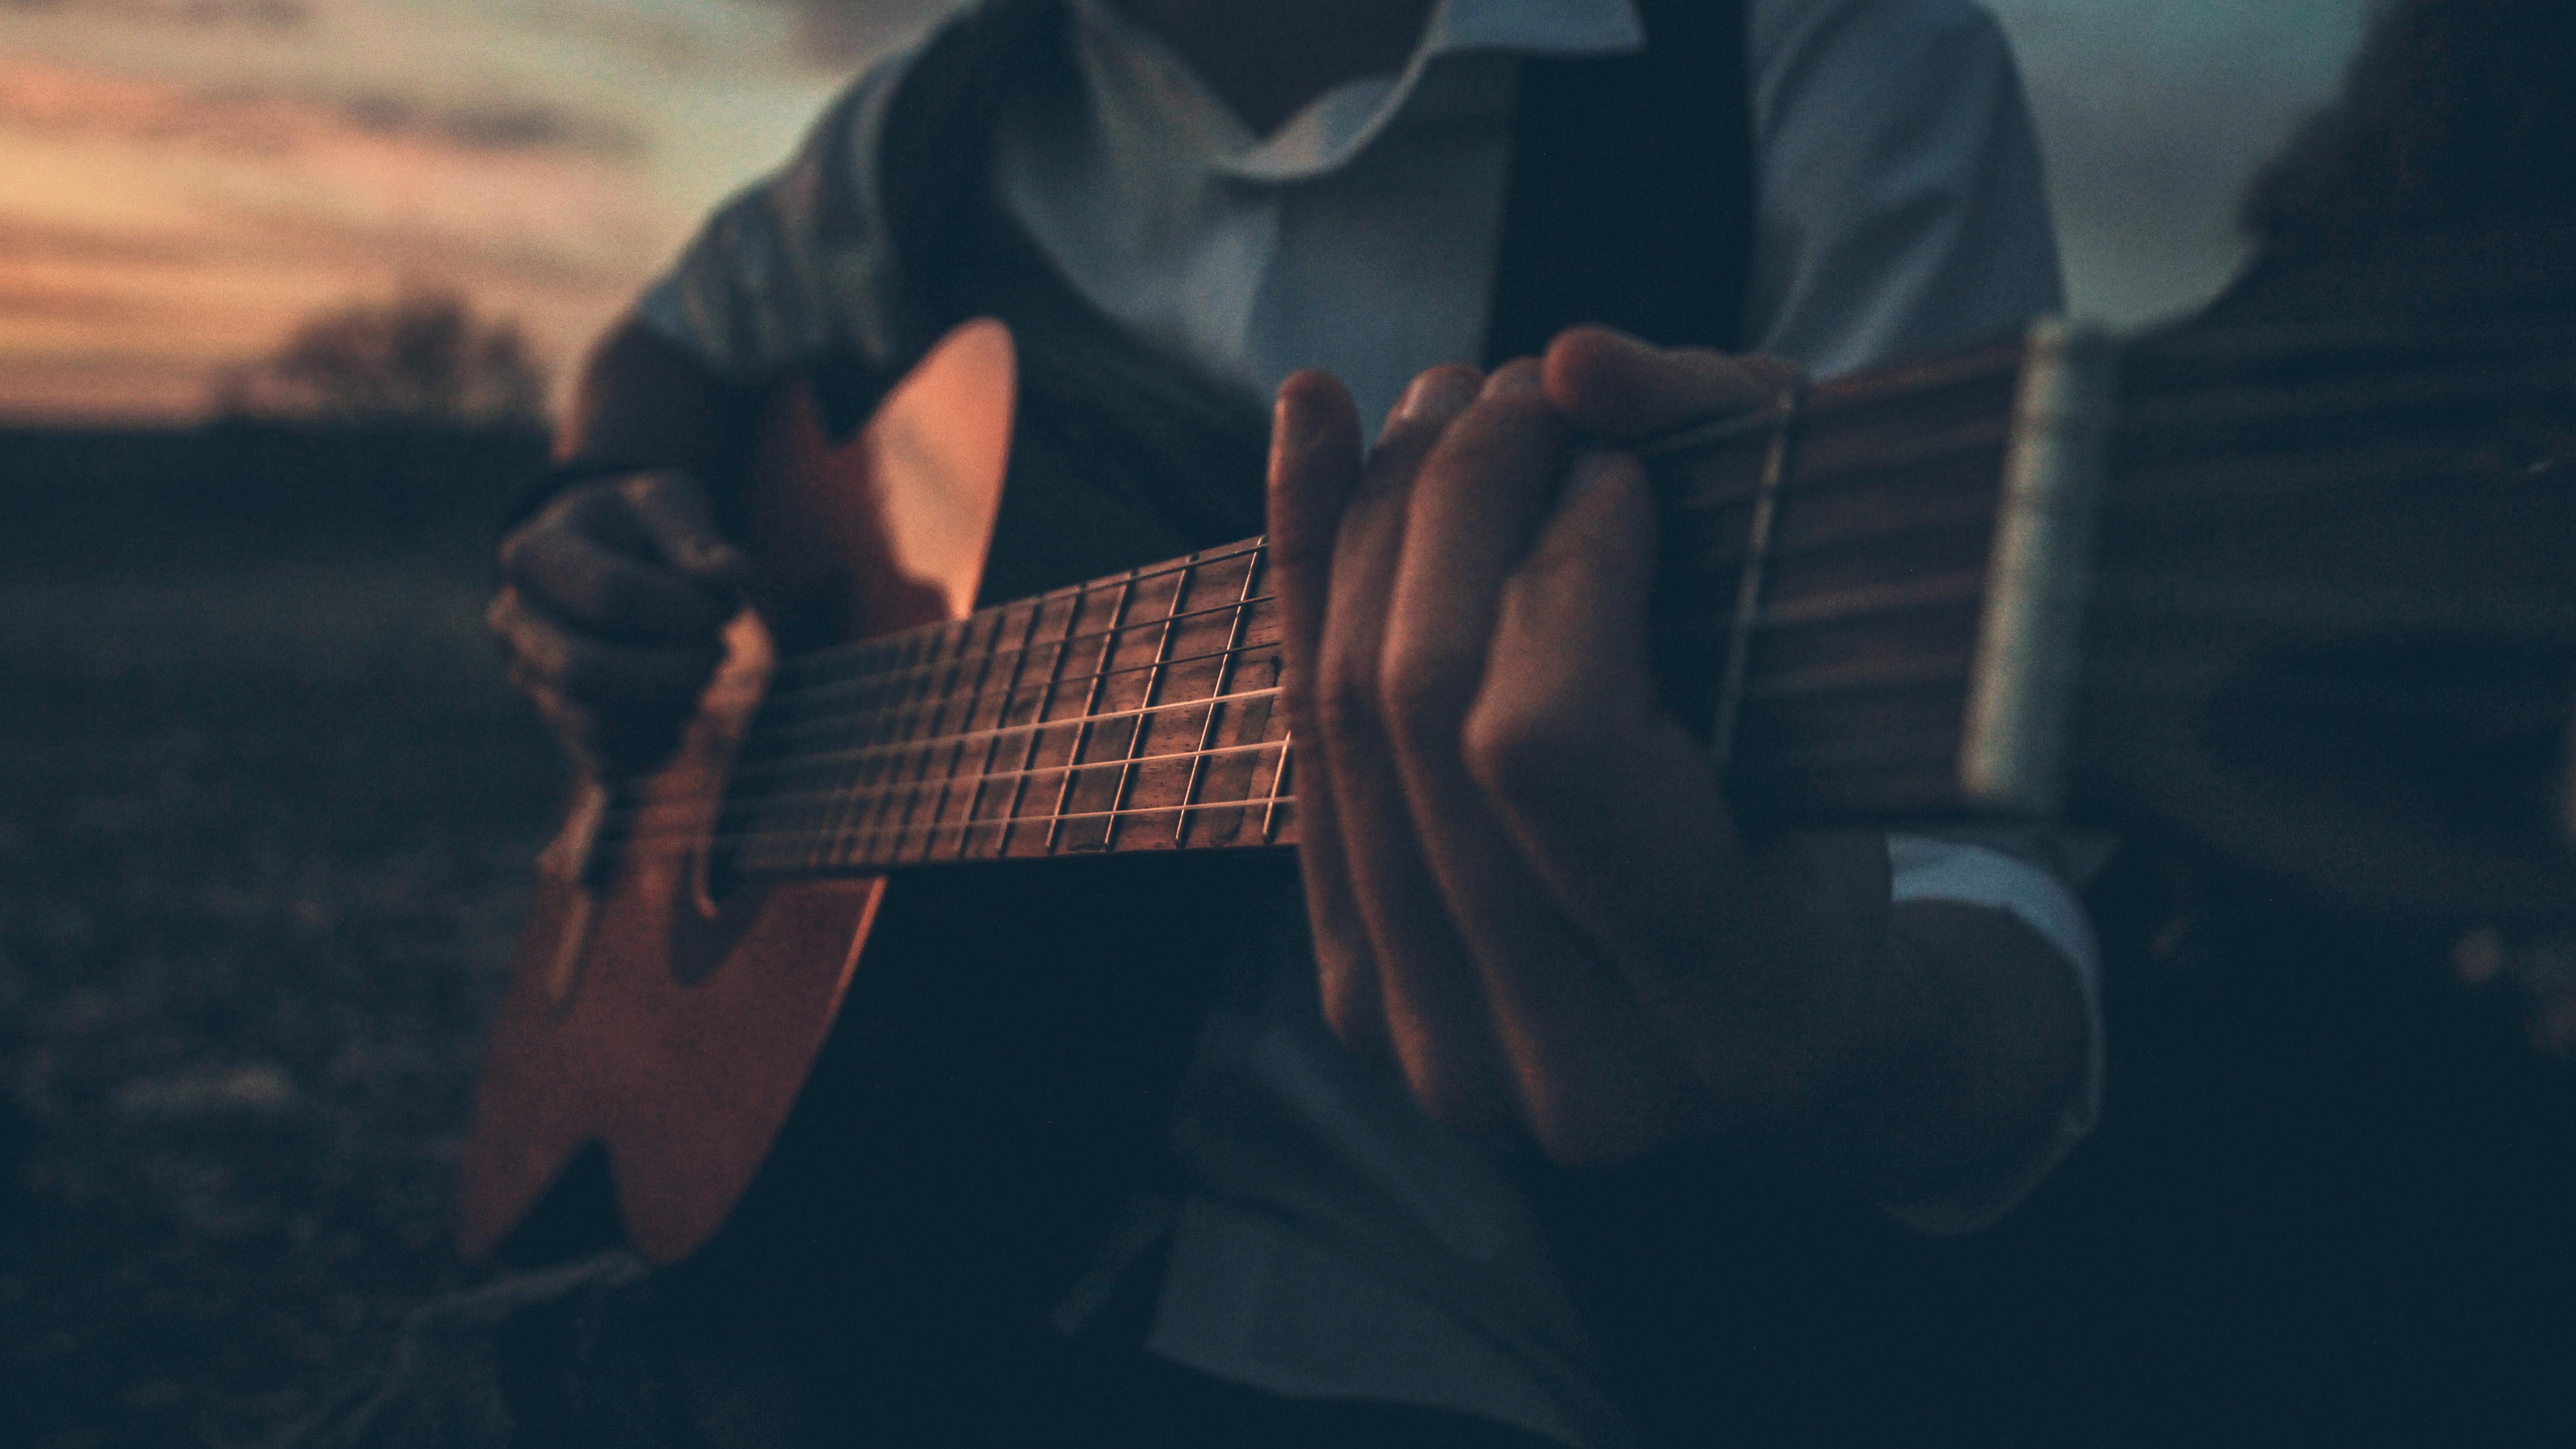 Boy Playing Guitar Outdoors 5k Hd Photography 4k